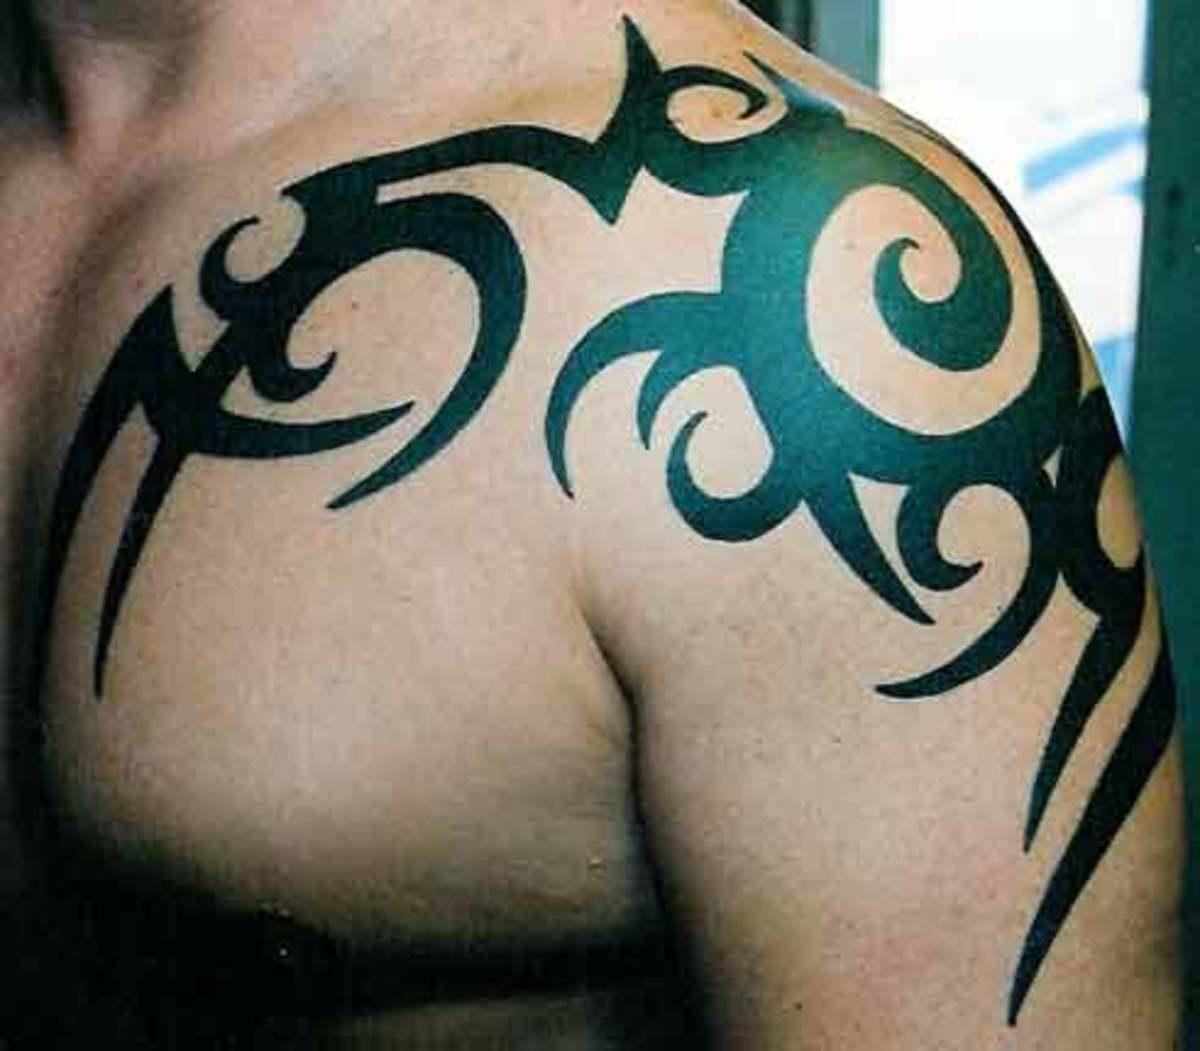 Tribal Shoulder Band - Tribal Tattoo